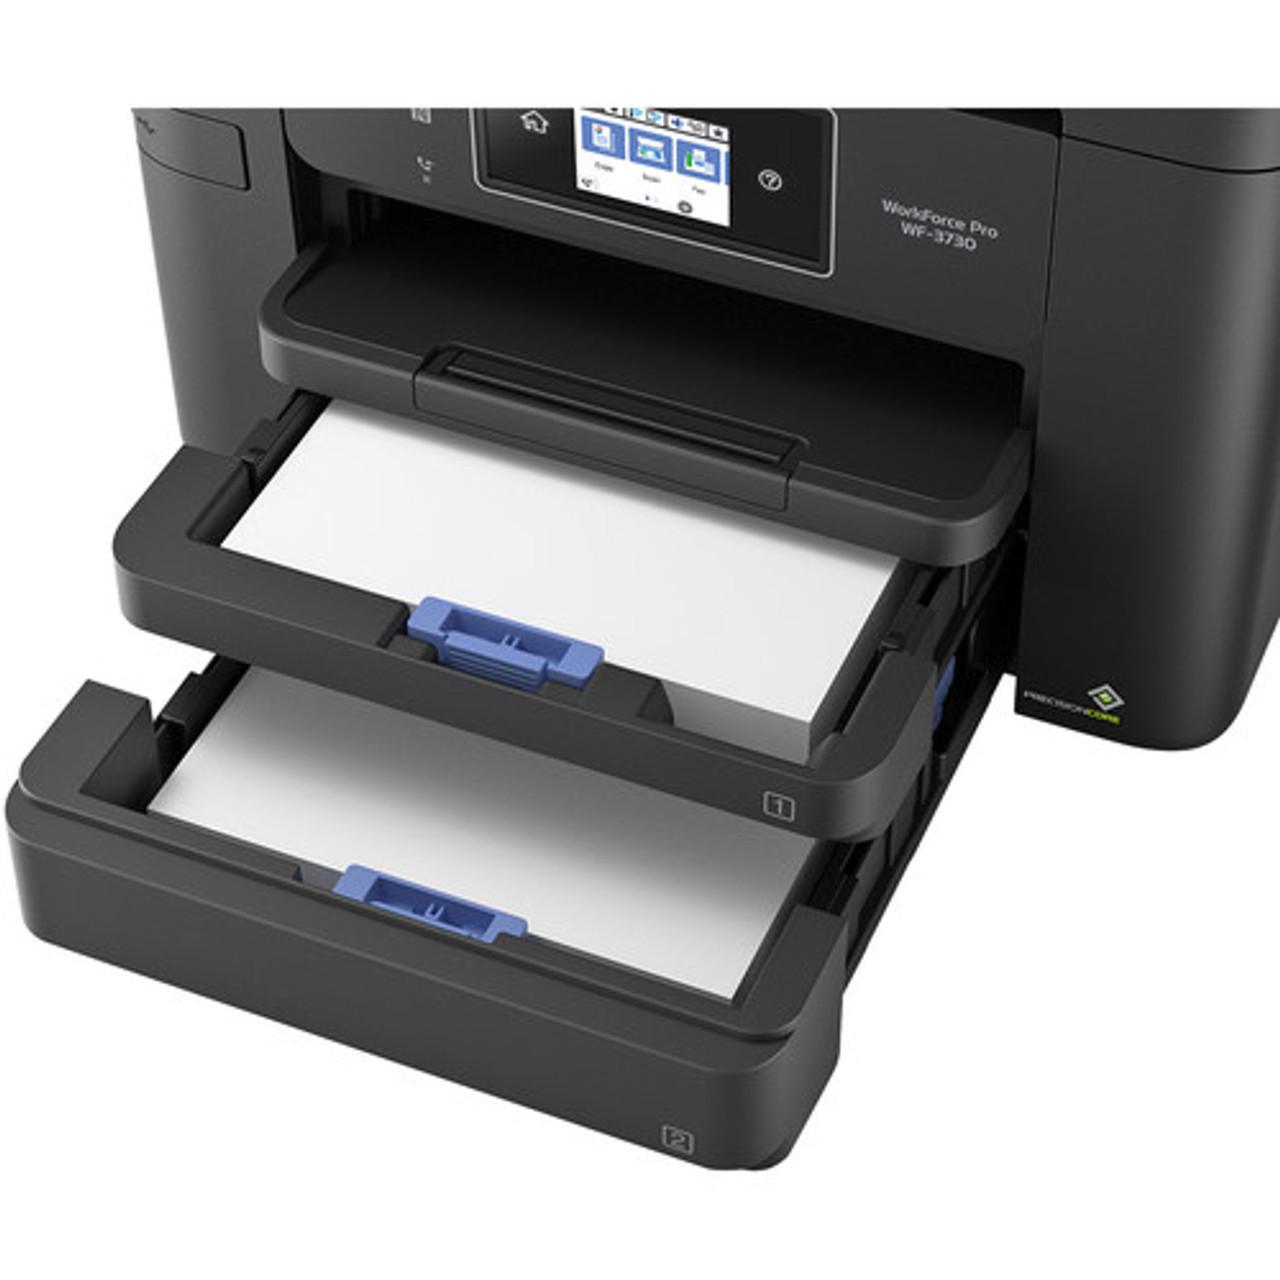 Epson C11CH04201-RB WorkForce Pro WF-3730 All-in-One Inkjet Printer – Certified Refurbished